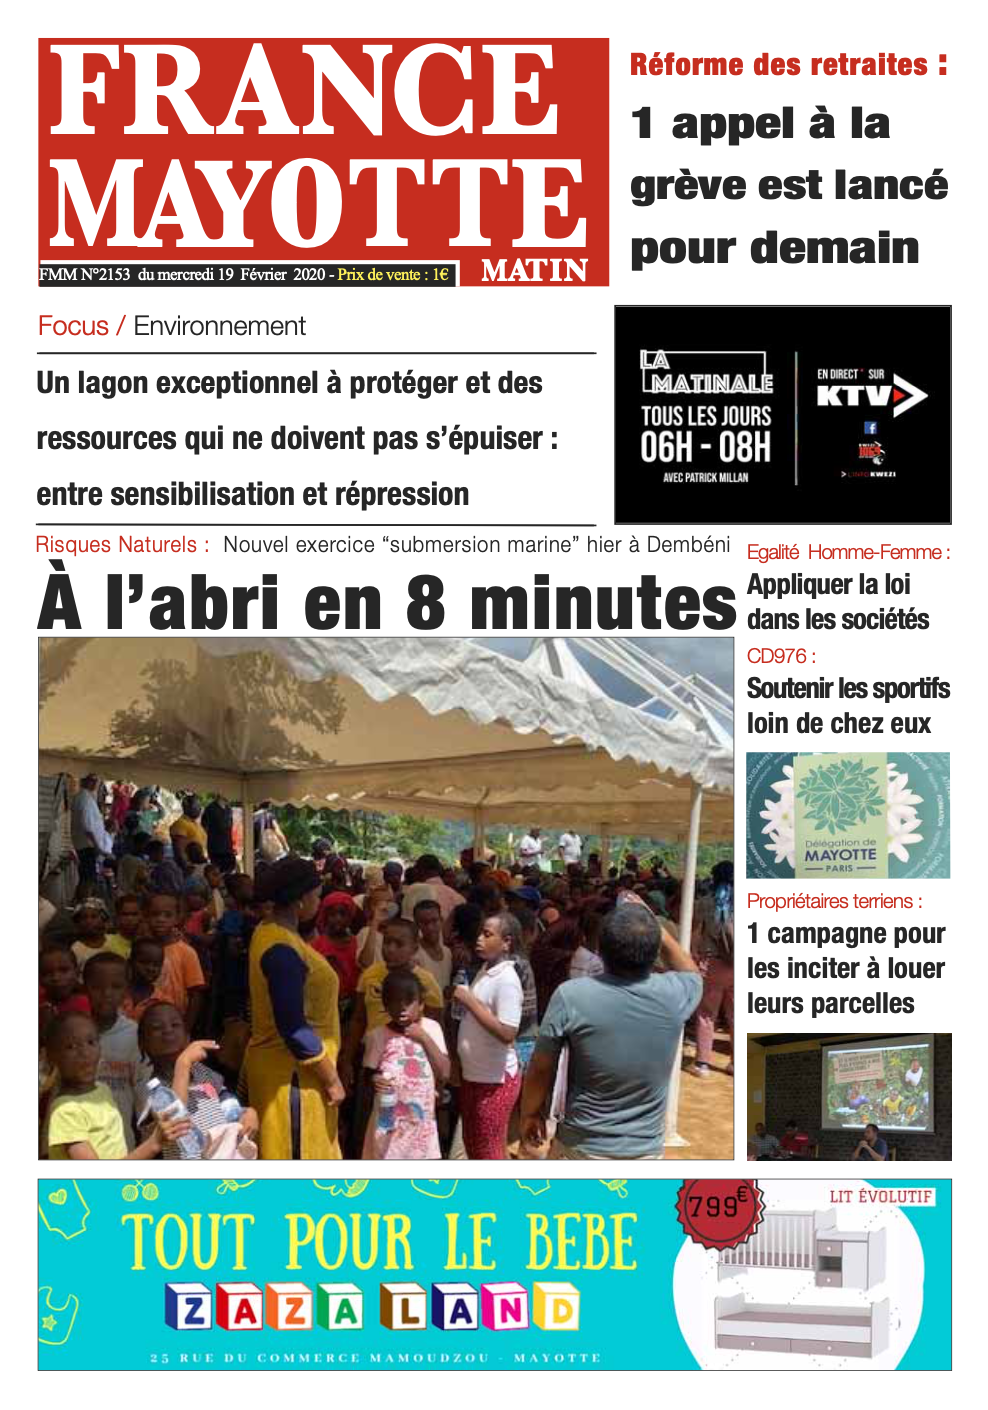 France Mayotte Mercredi 19 février 2020